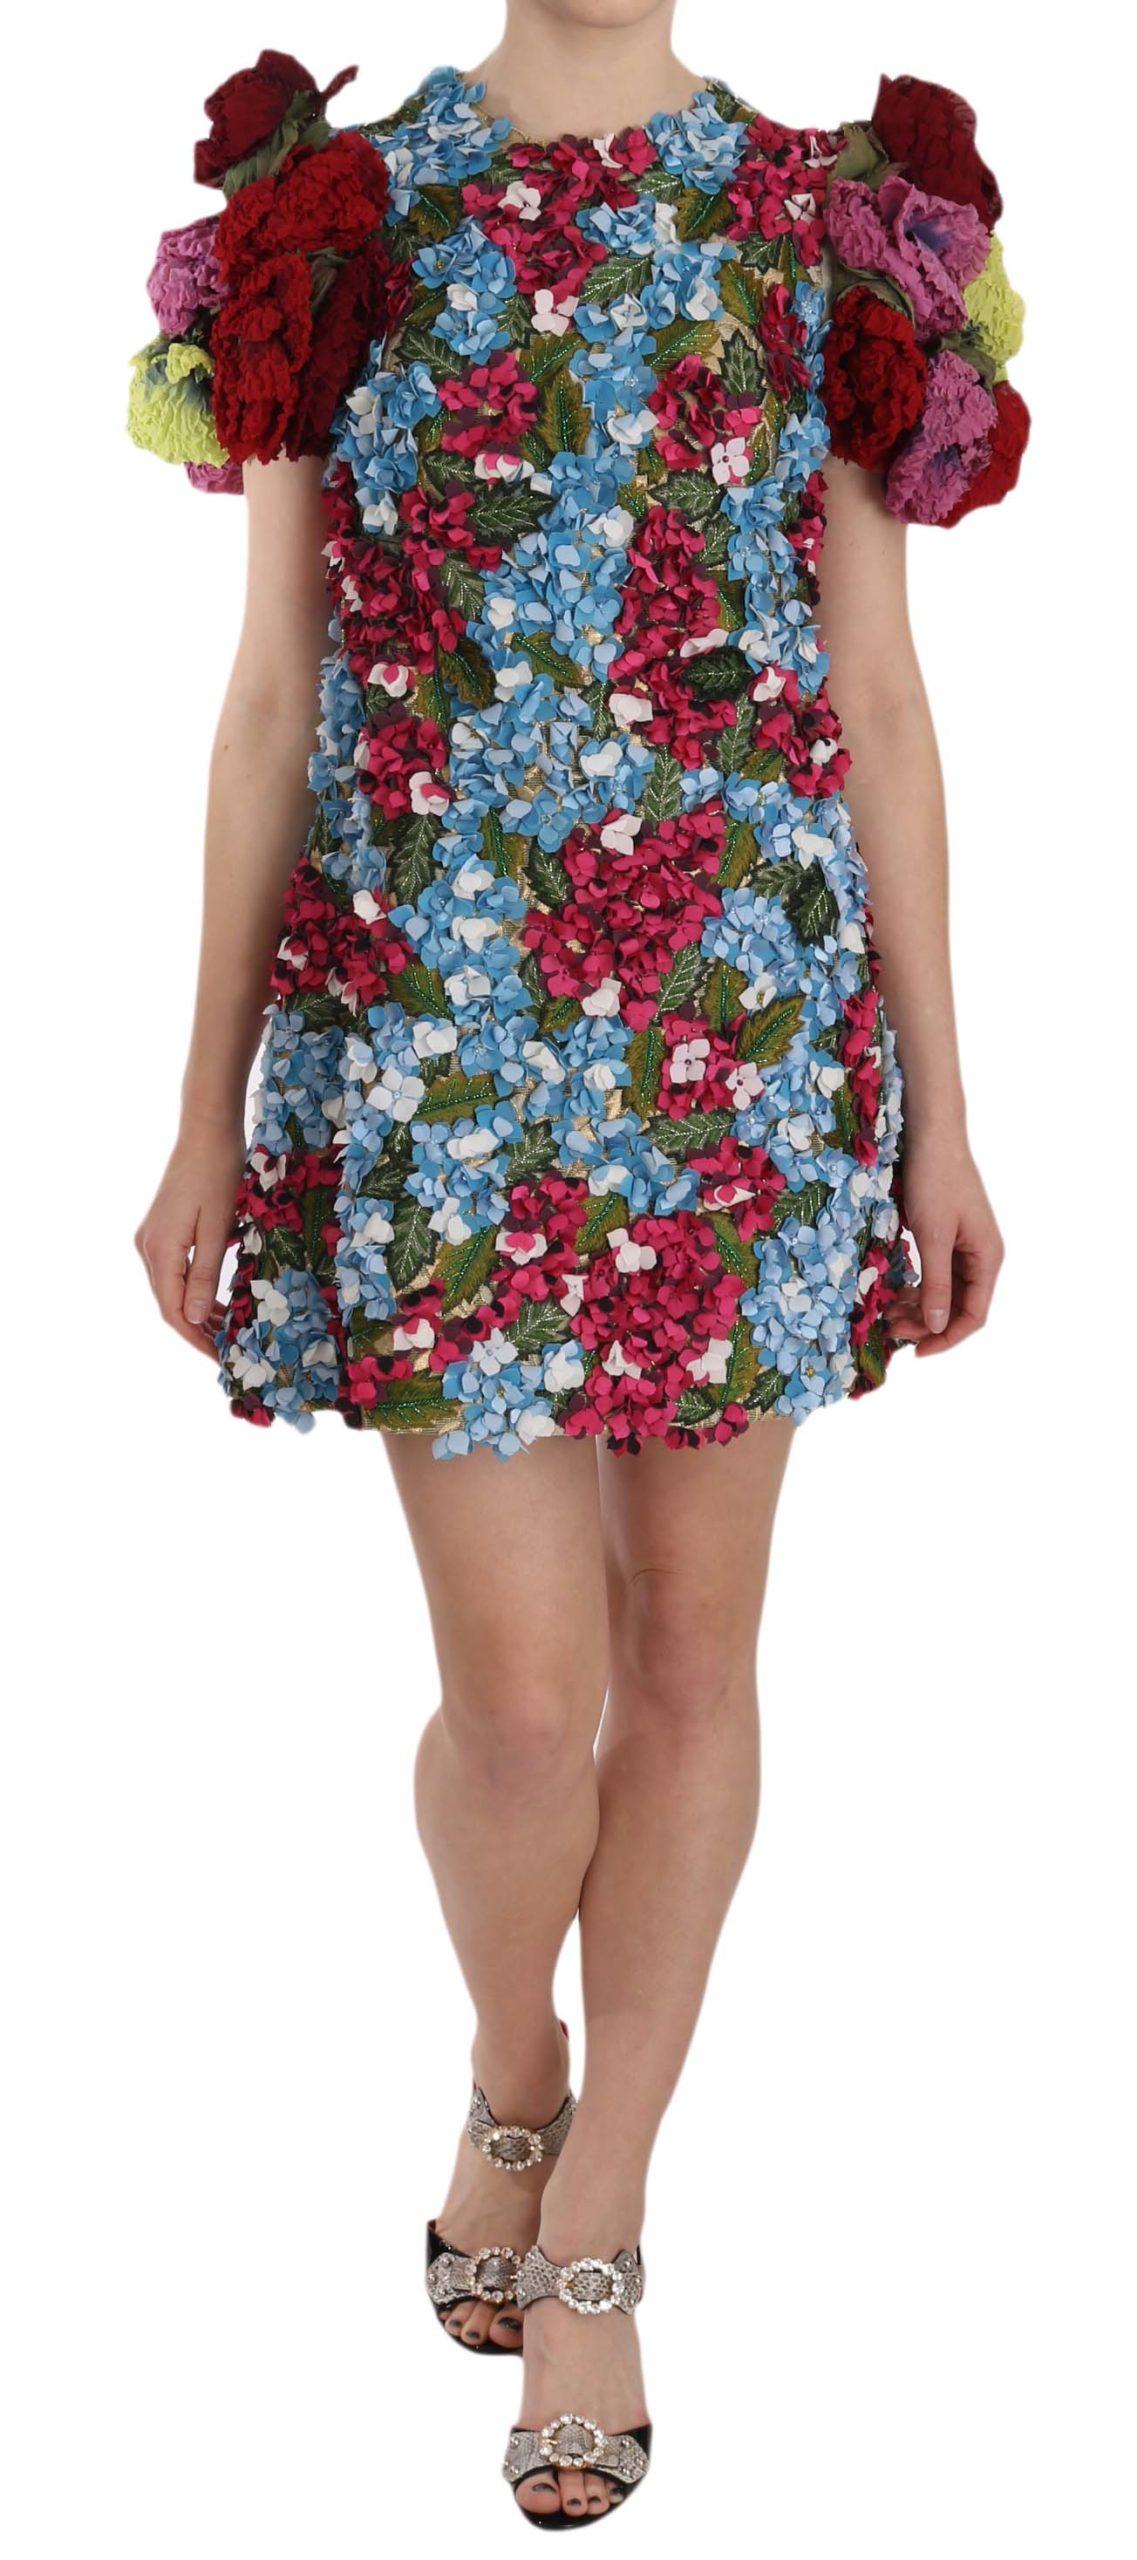 Dolce & Gabbana Women's Floral Button Crystal Mini Dress Multicolor DR1623 - IT38 | S